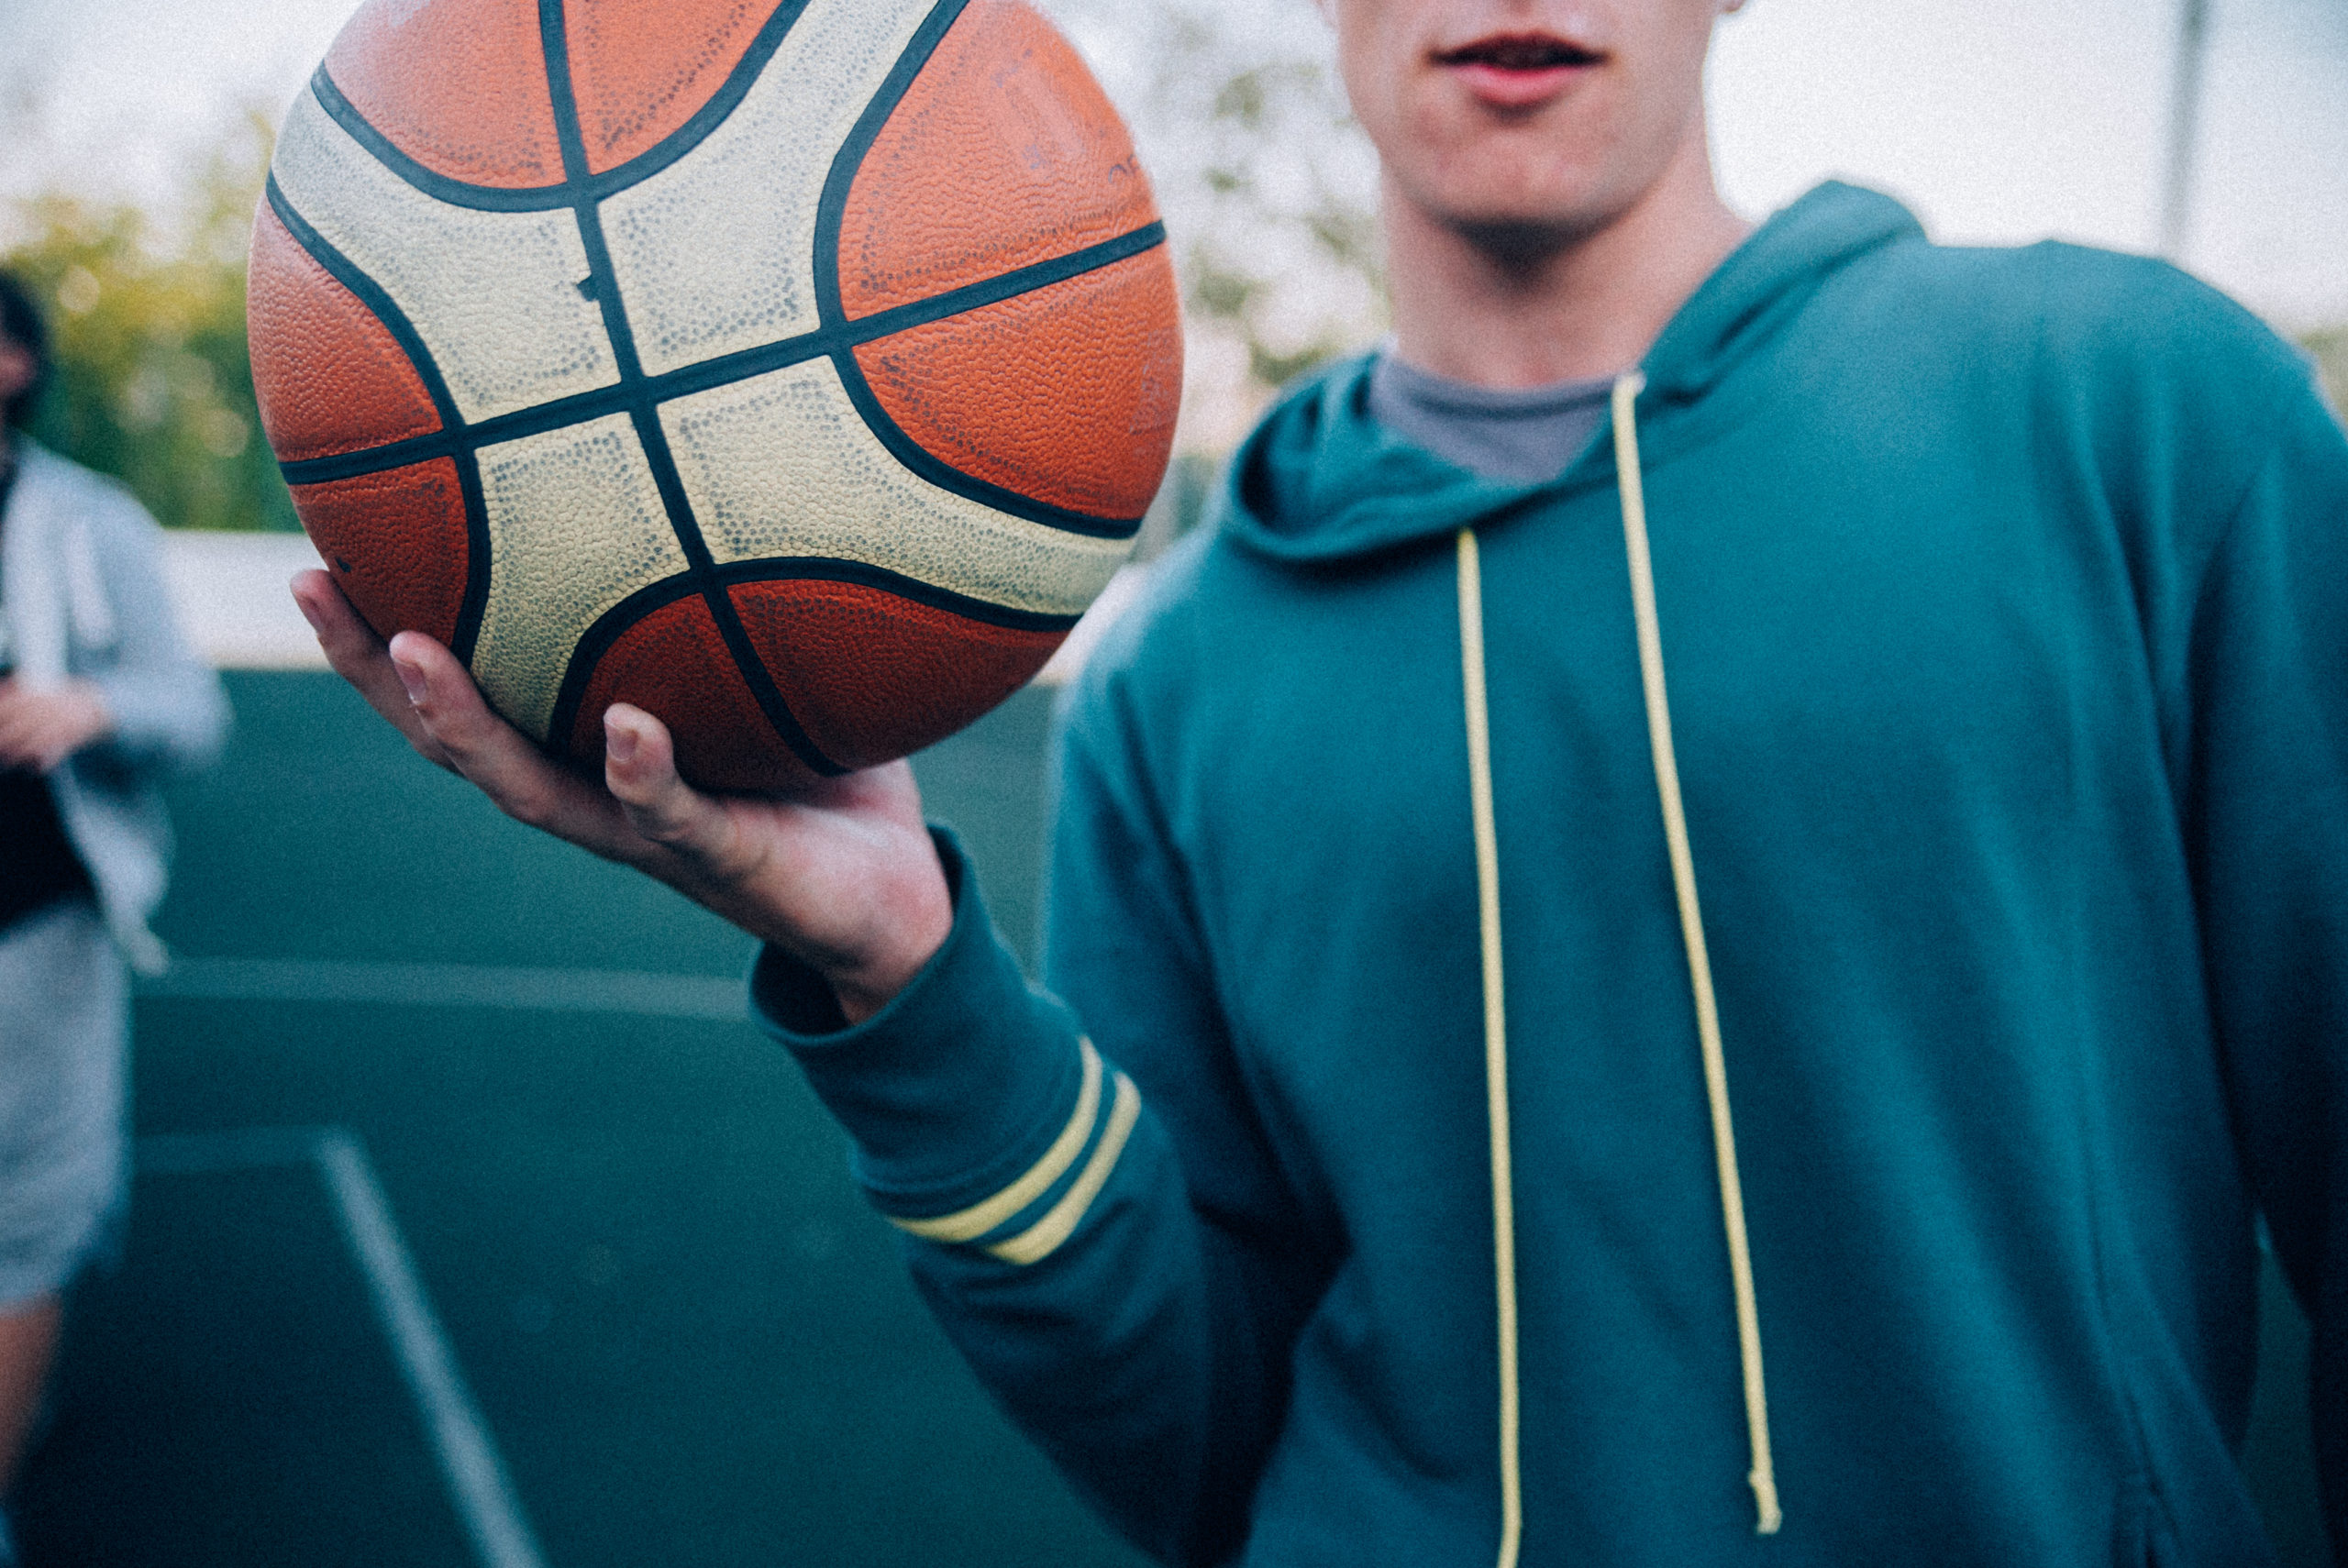 Communication sportive